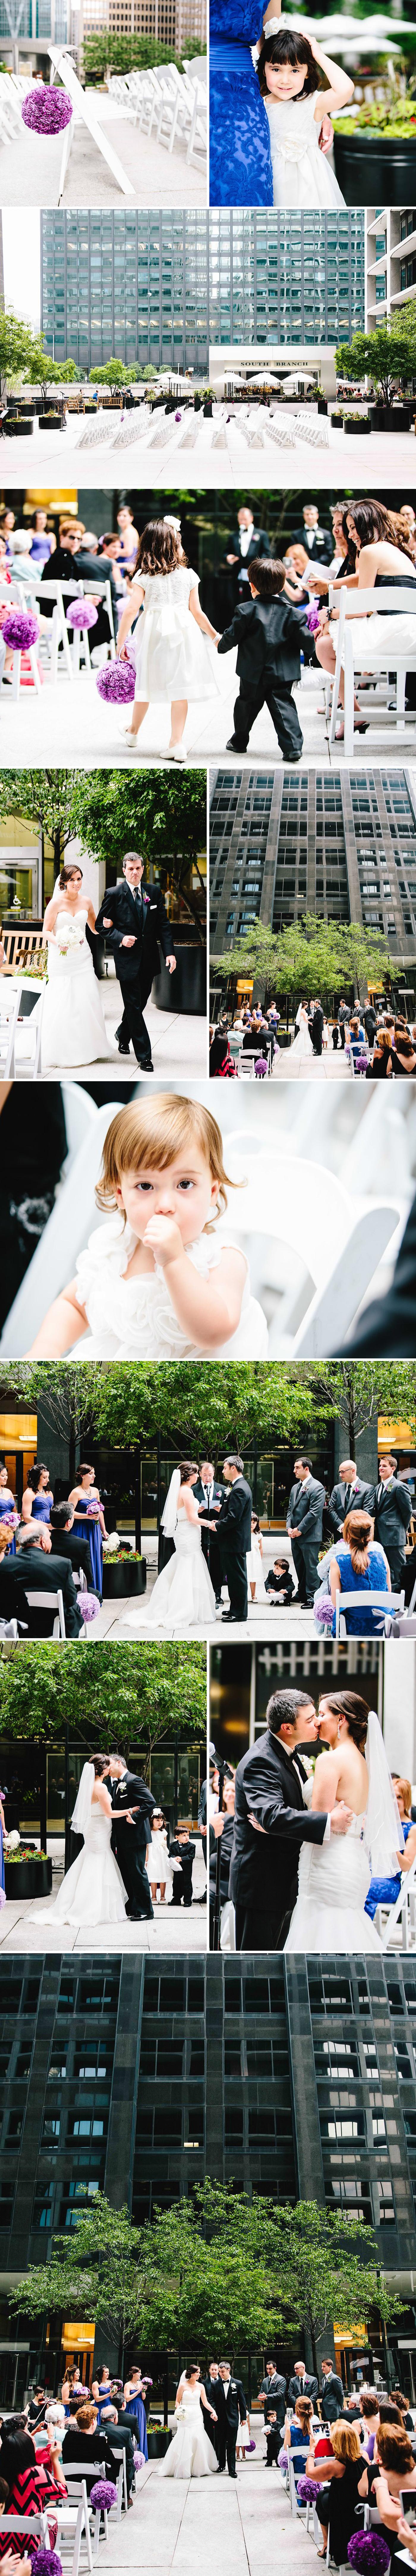 chicago-fine-art-wedding-photography-cassata2